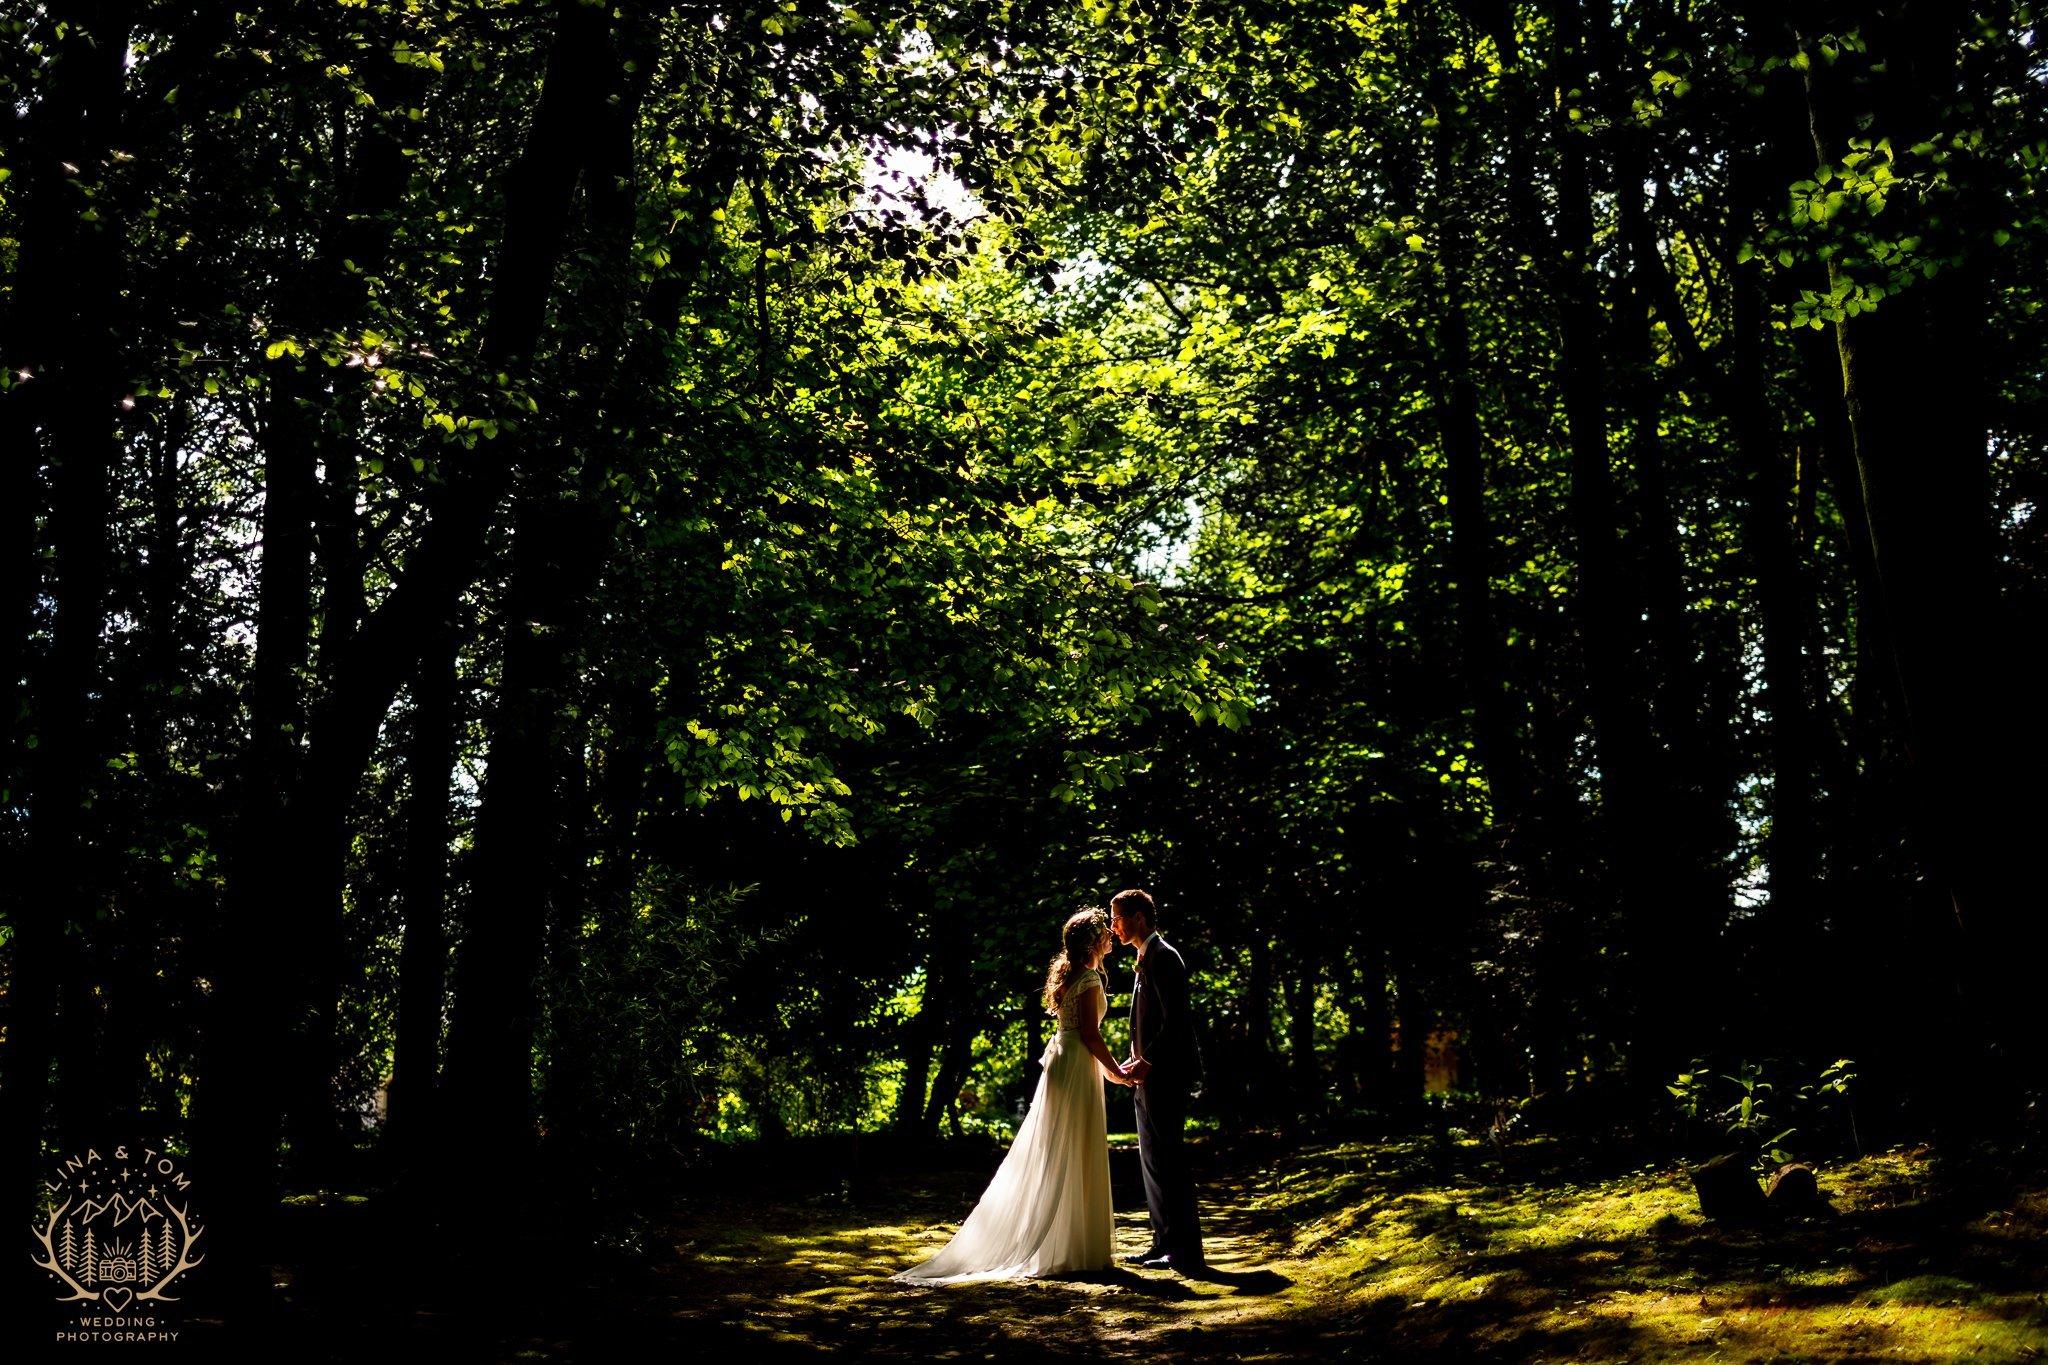 Carrie and James - Matara Center Wedding Photography